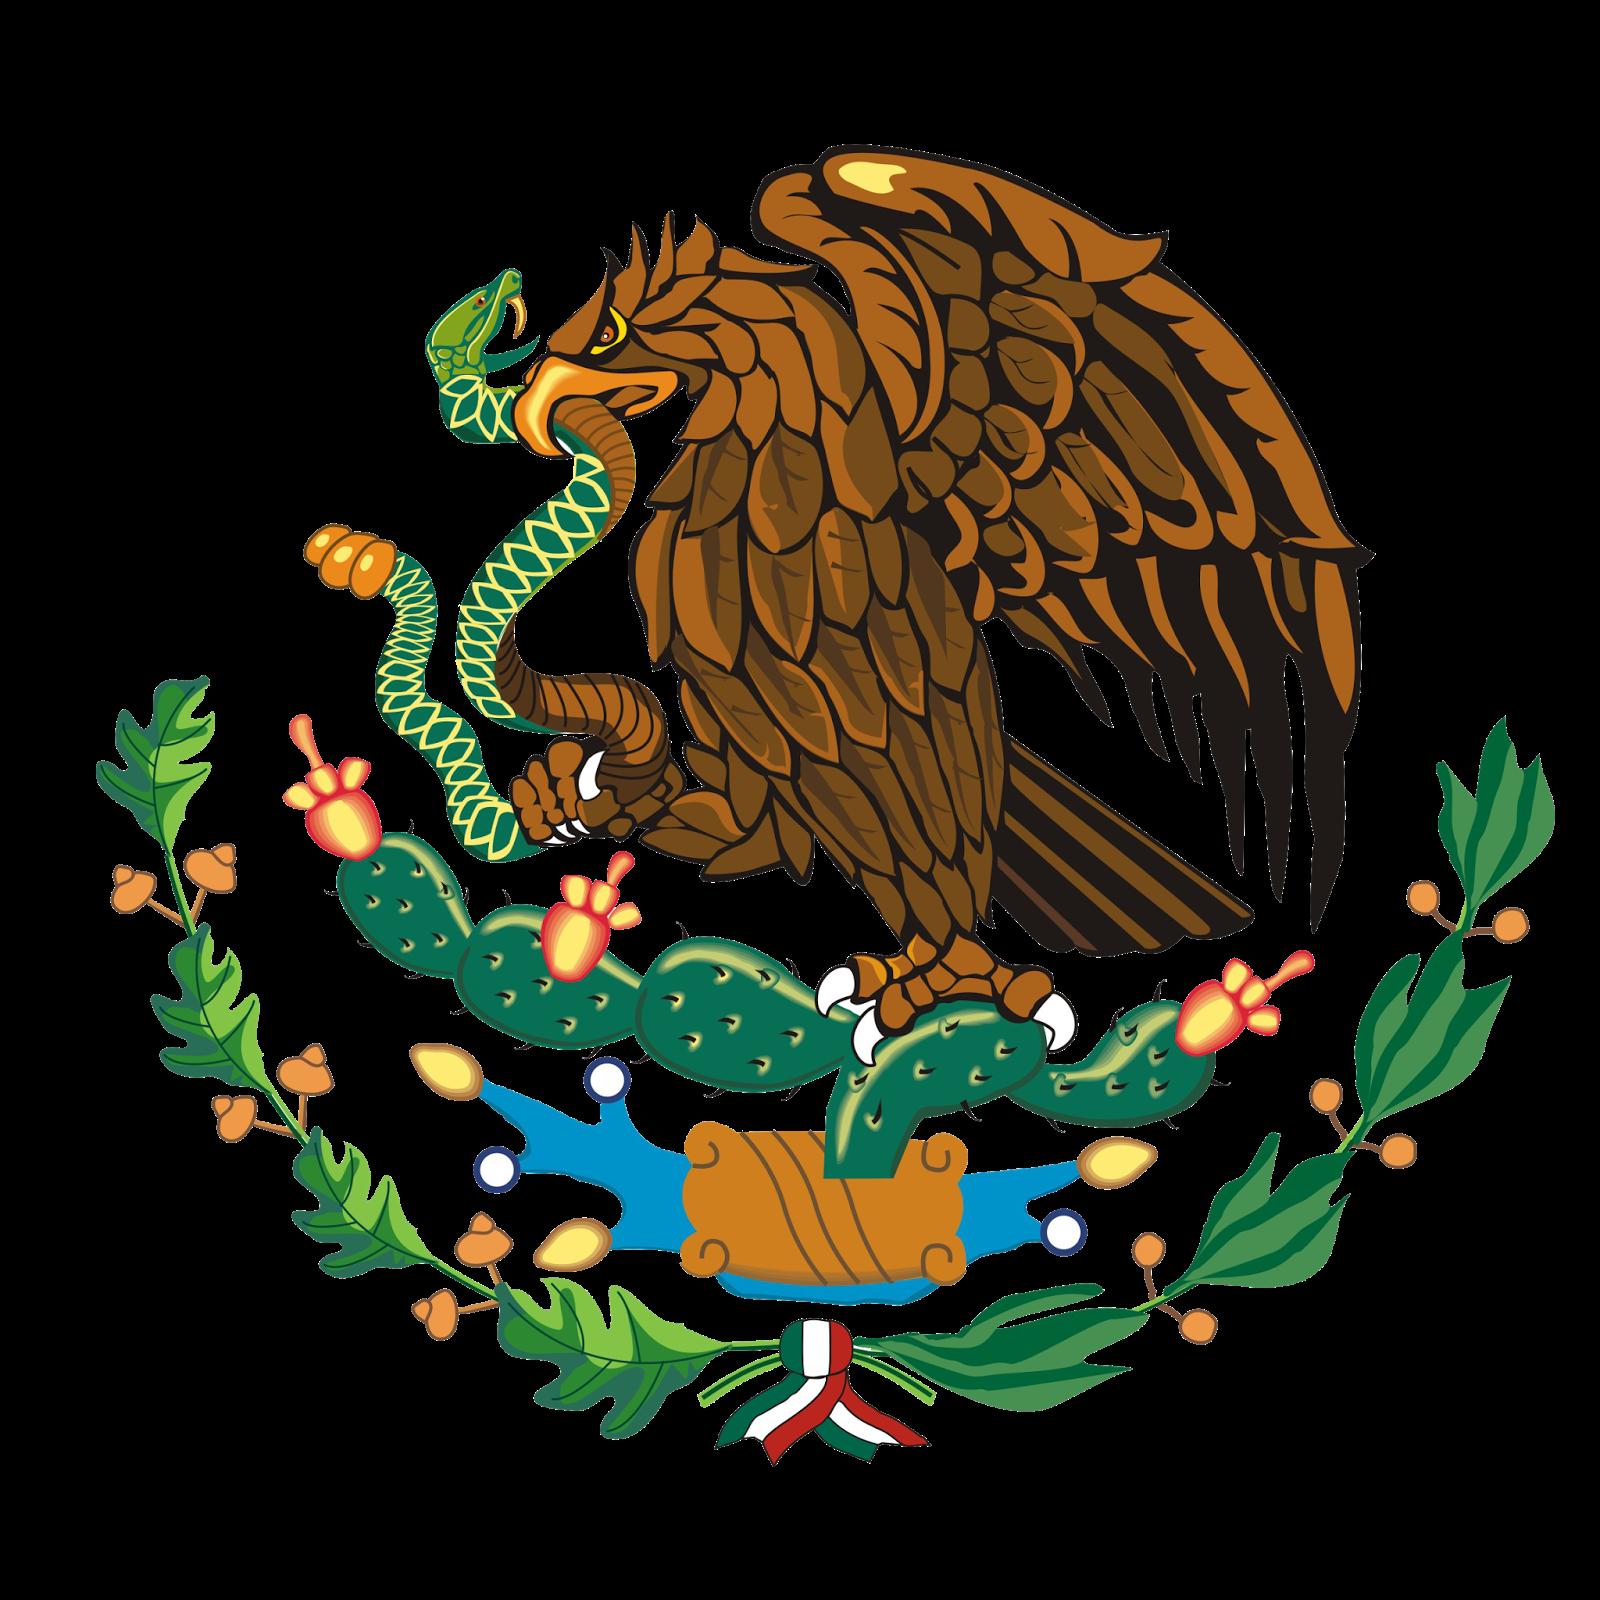 Escudo Mexicano Aguila De La Bandera Mexicana Escudo De Mexico Aguila Mexicana